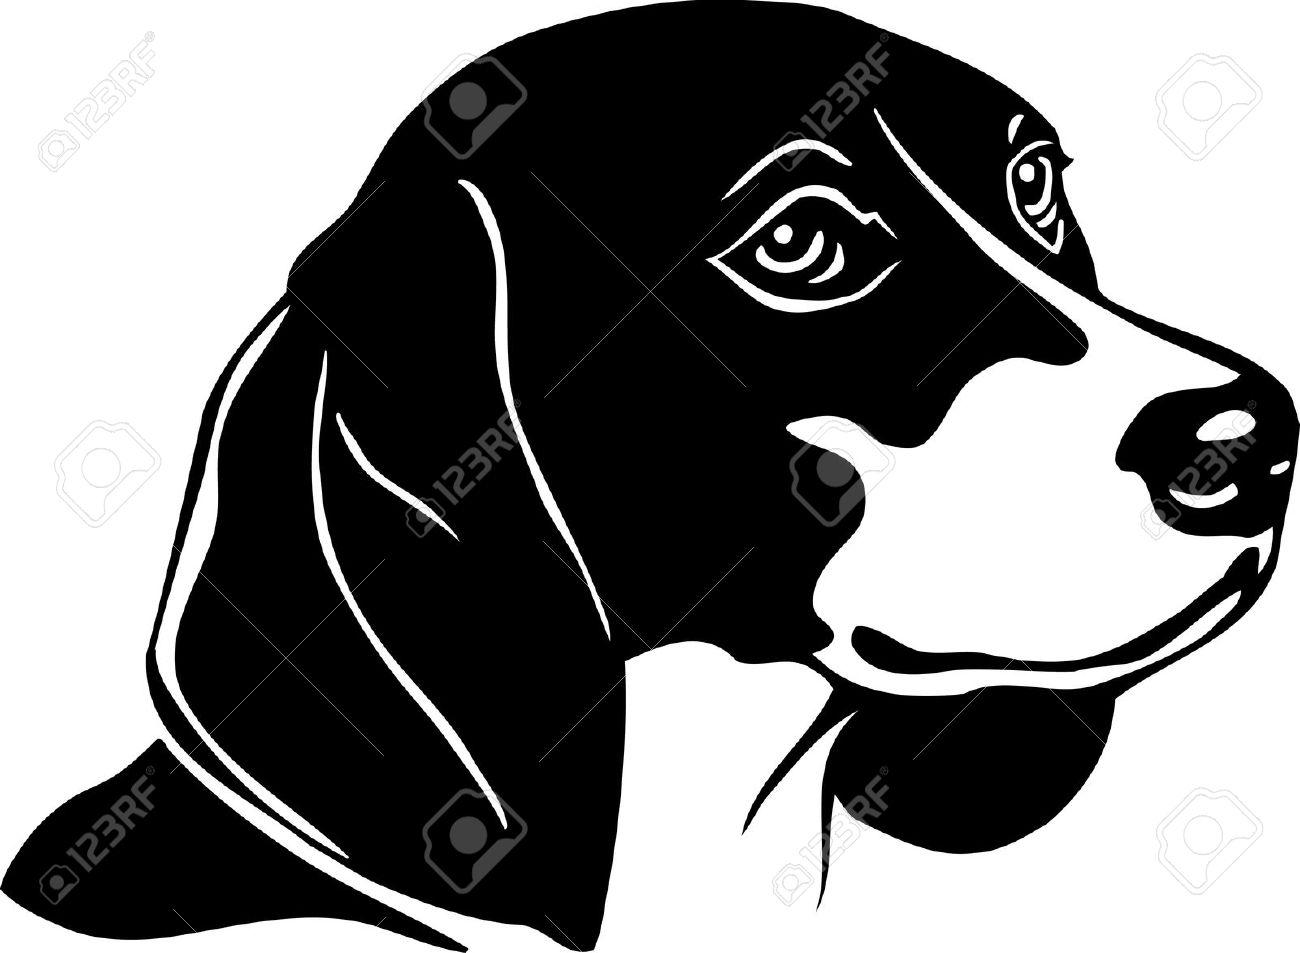 Beagles clipart black and white banner black and white Free Beagle Clipart Black And White, Download Free Clip Art, Free ... banner black and white